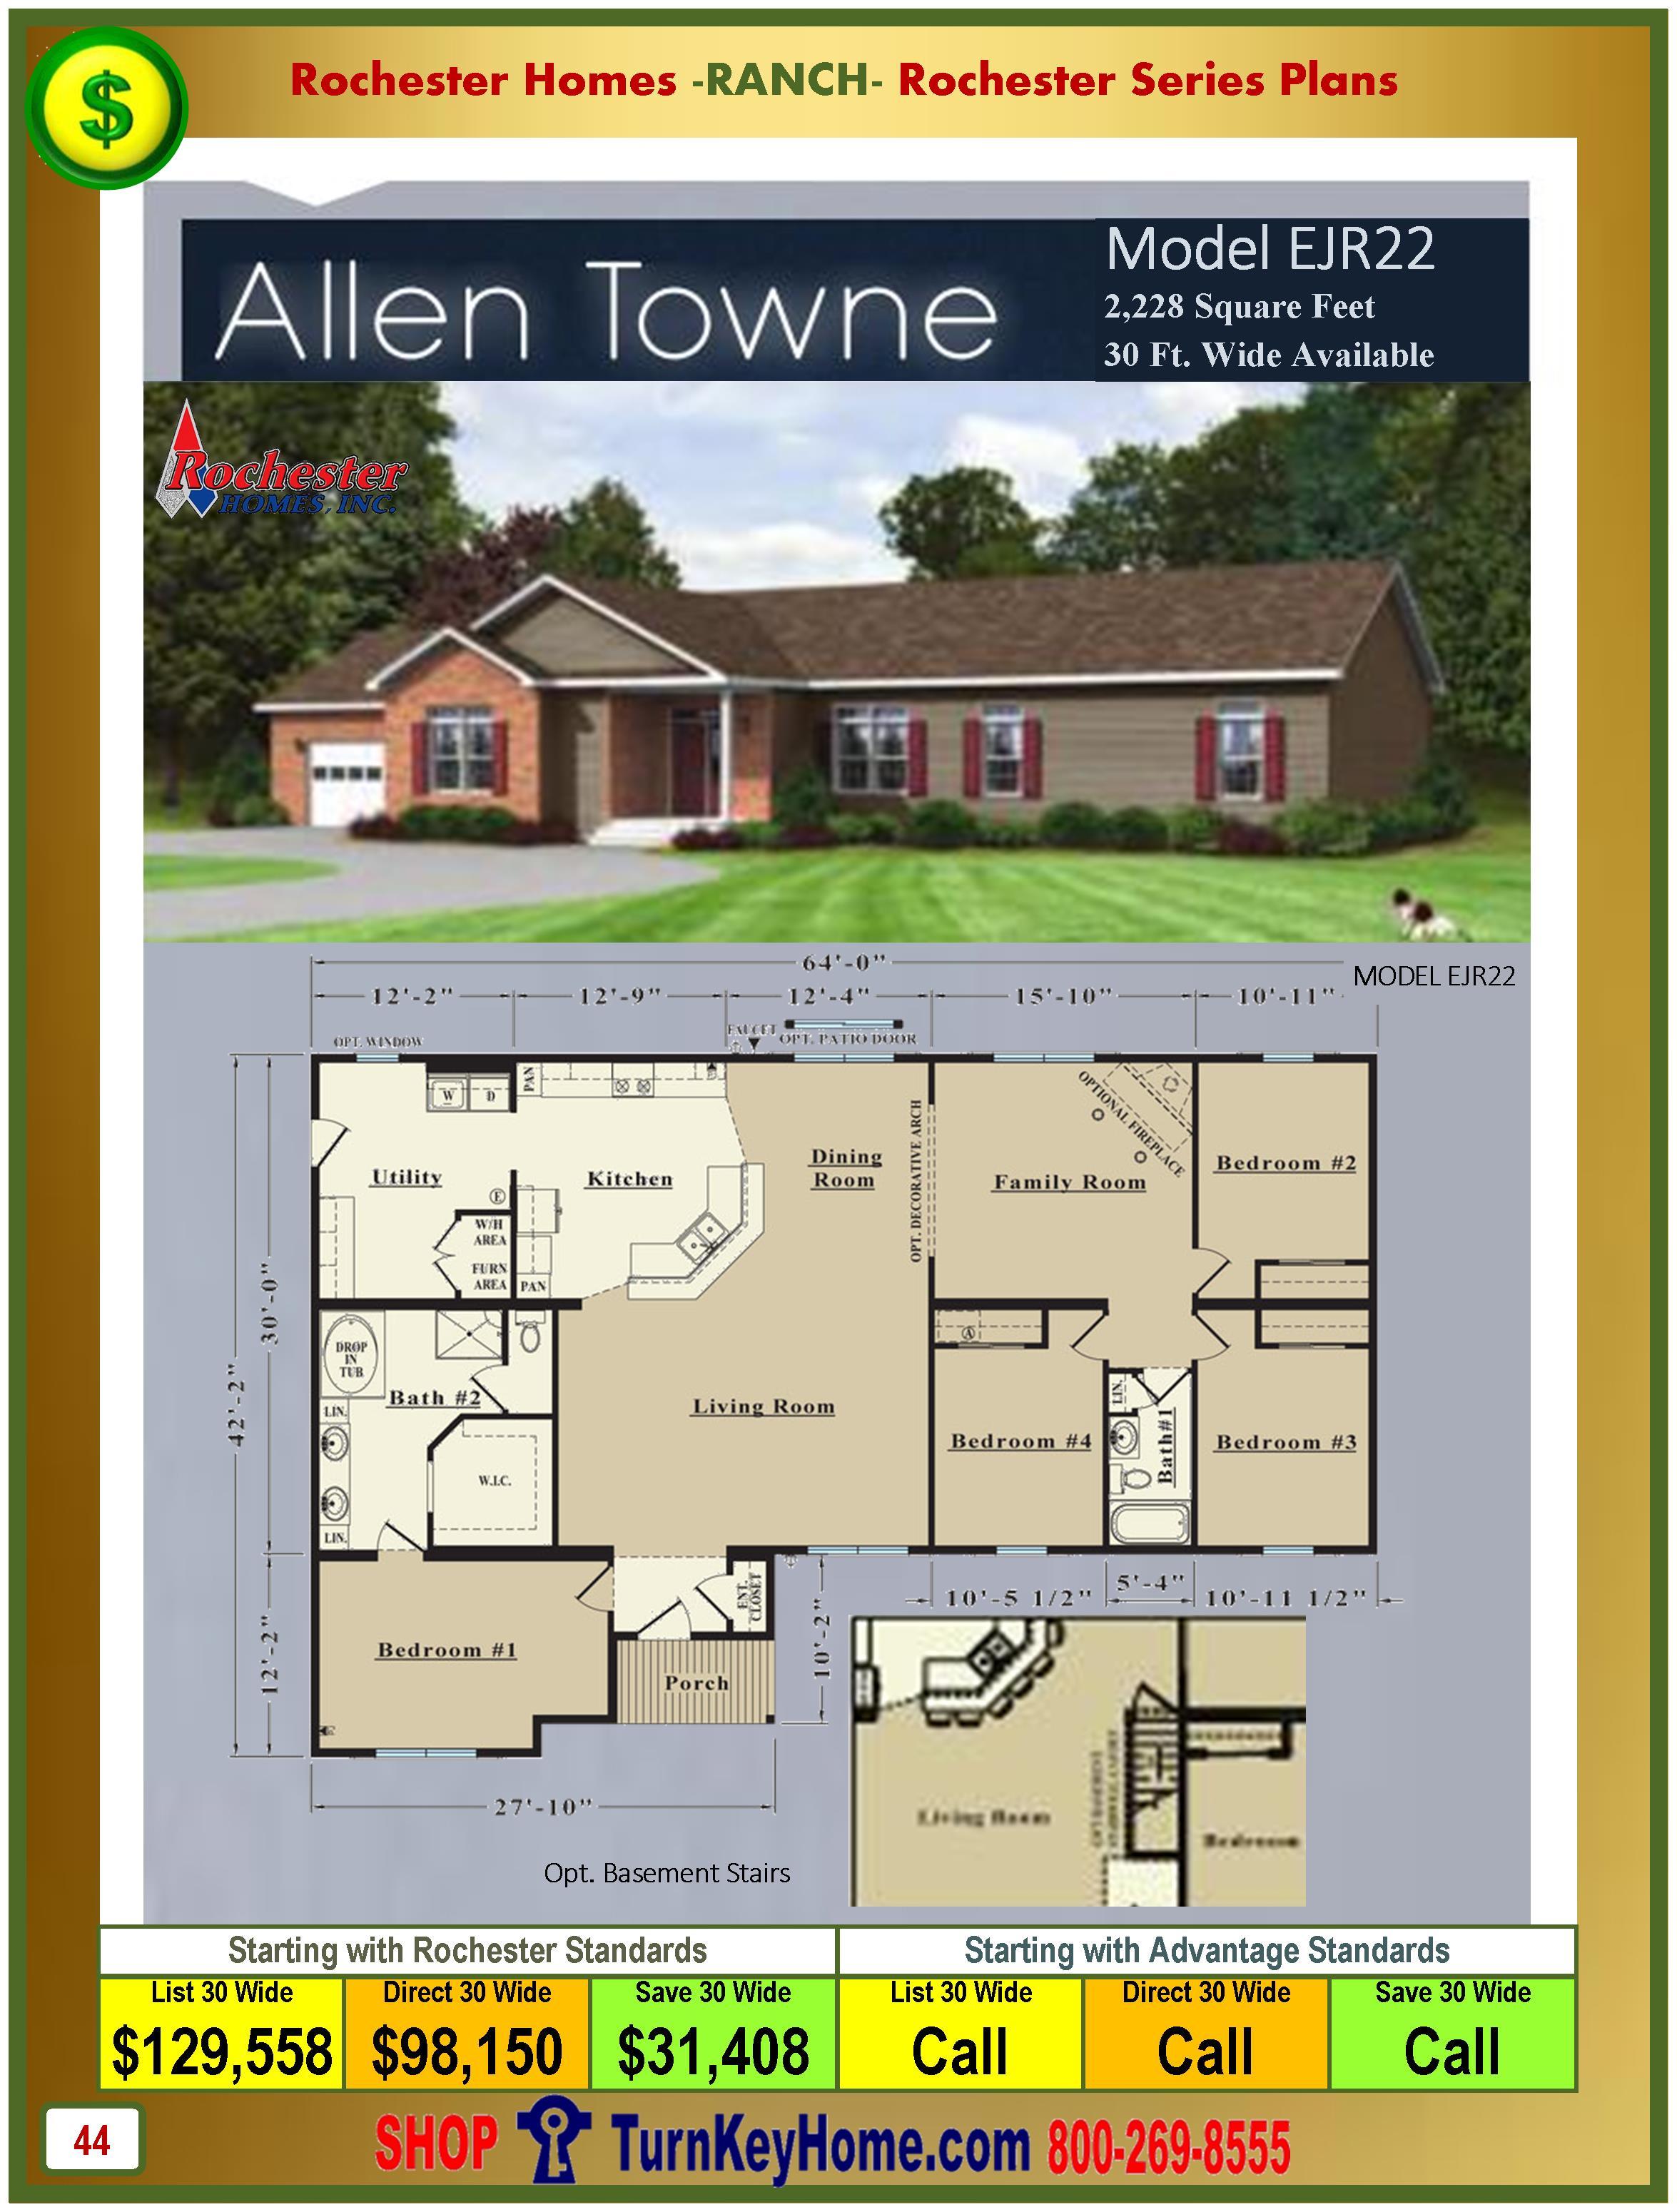 Modular.Homes.Rochester.Home.Inc.Allen.Towne.EJR22.Ranch.Plan.Price.Catalog.P44.1215